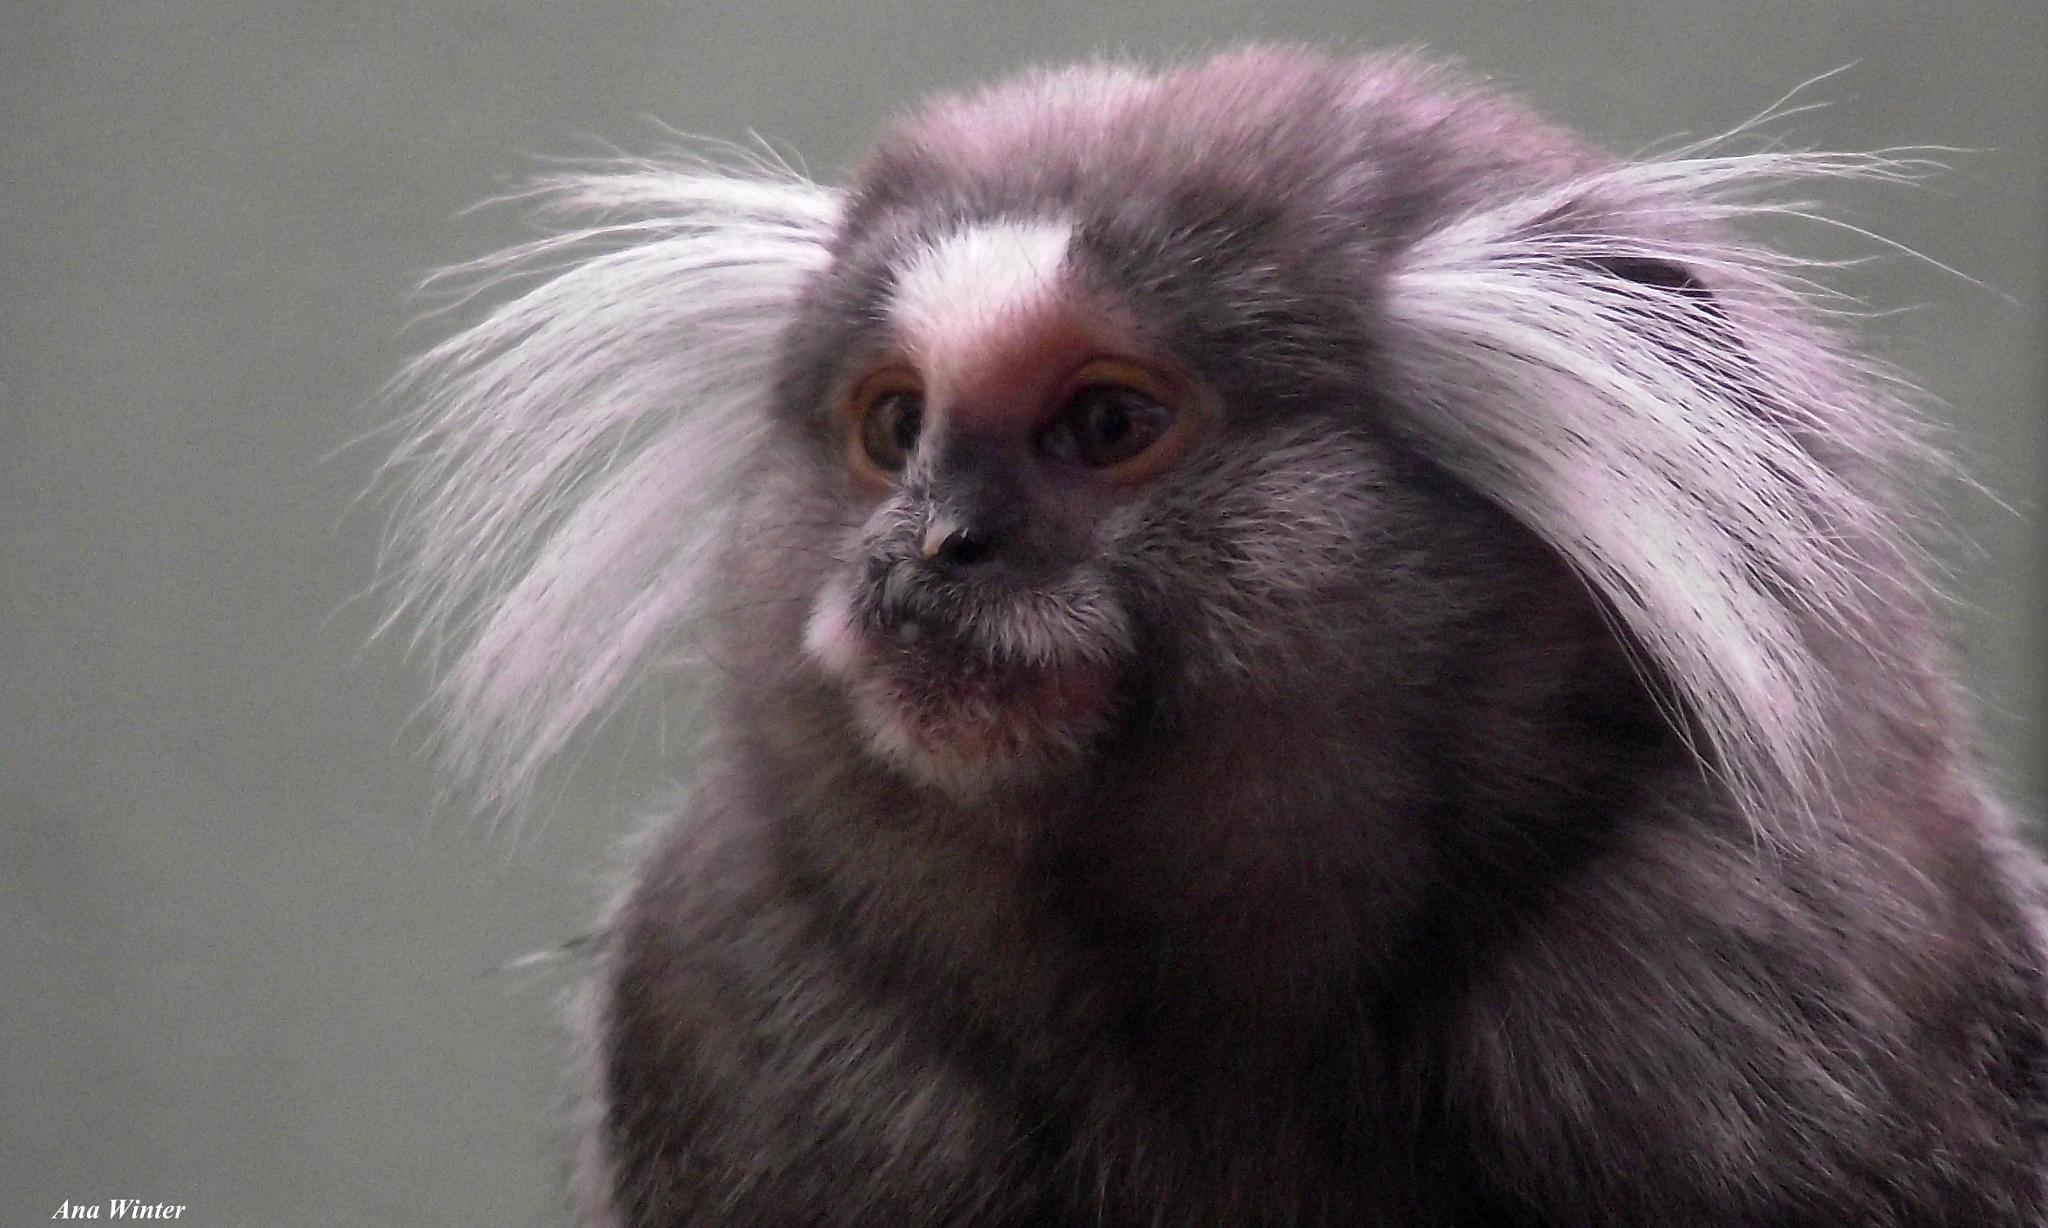 Funny little monkey  by Ana Winter